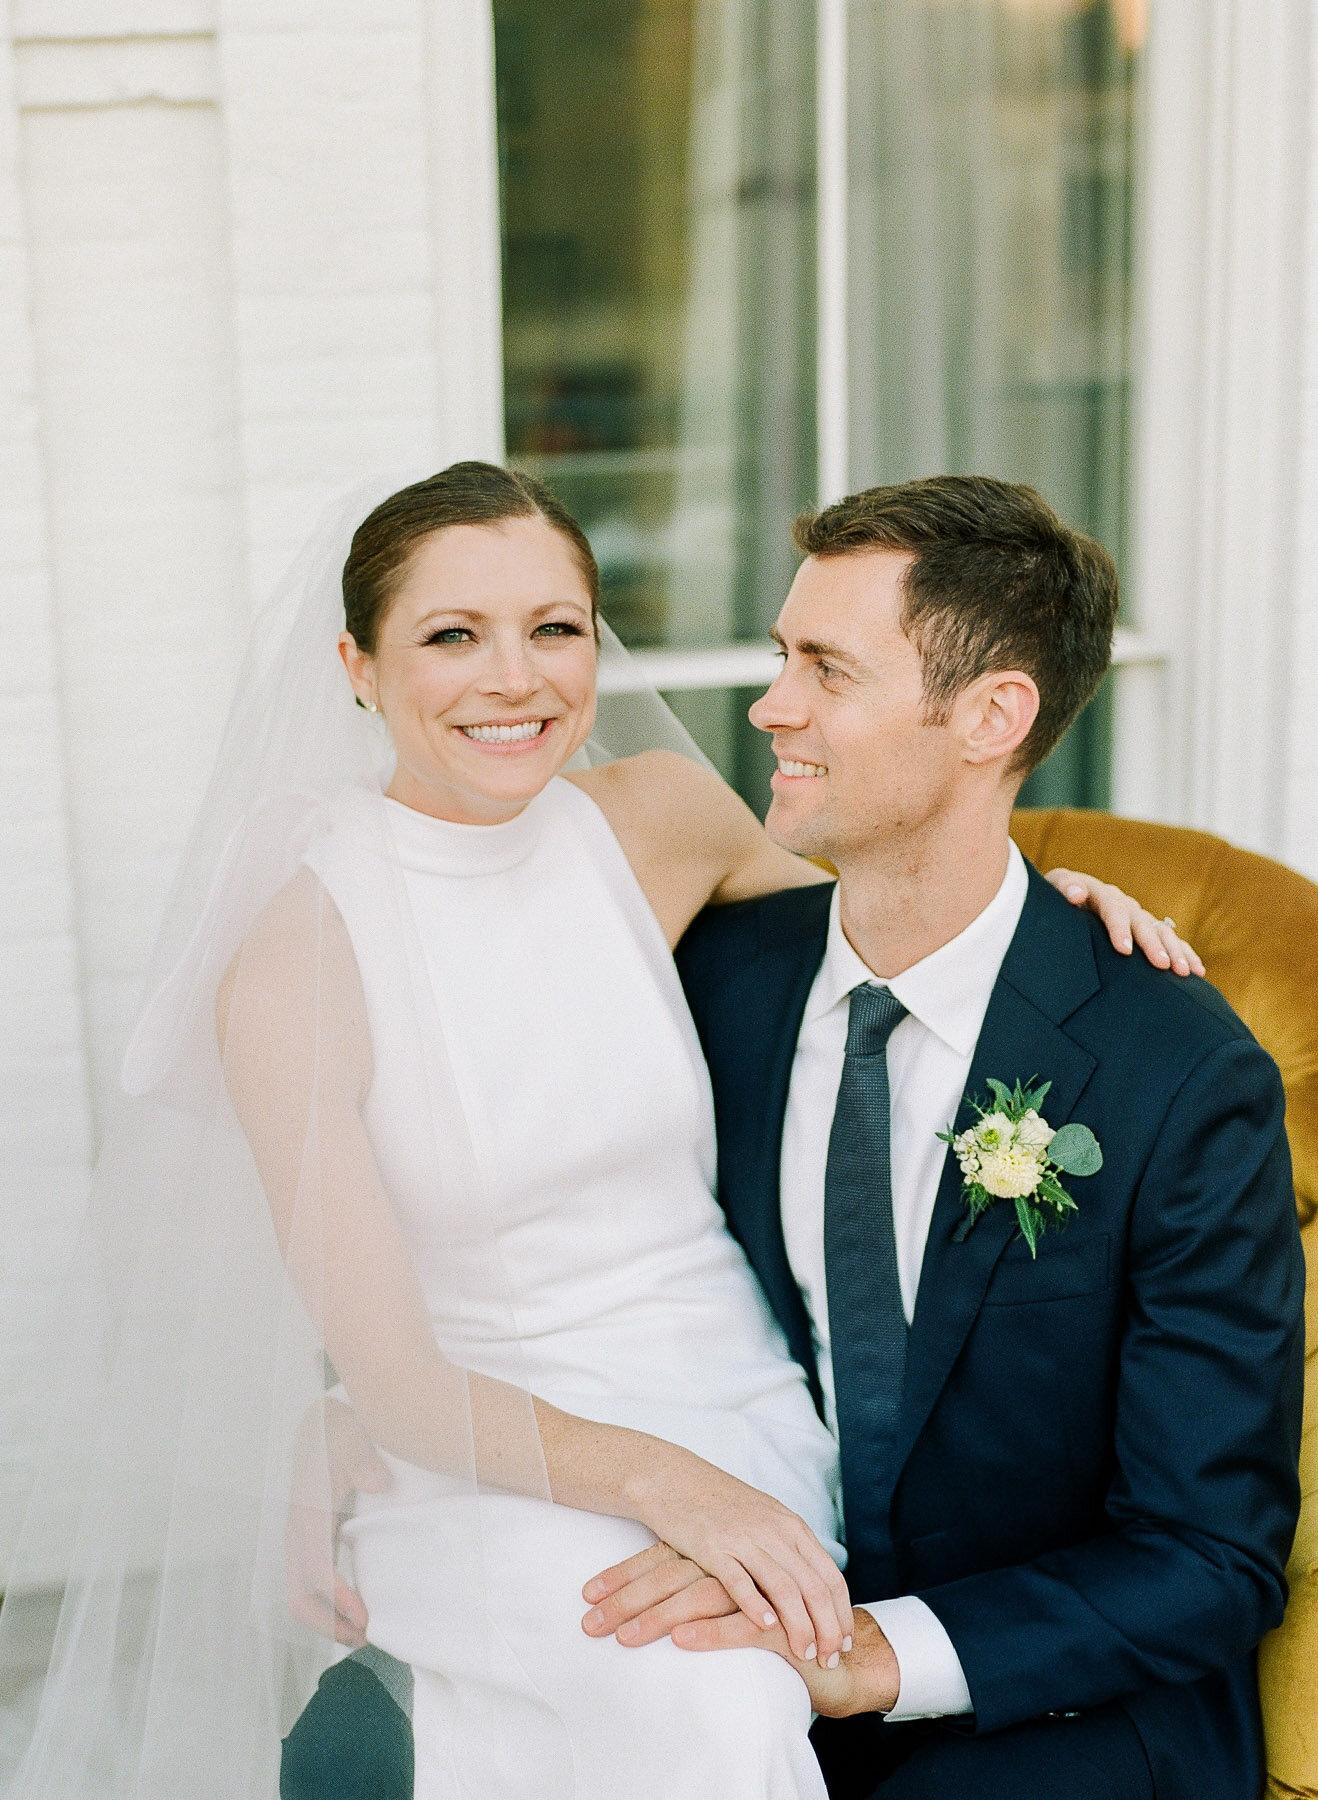 Adelphi Saratoga Wedding by Michelle Lange Photography-32.jpg